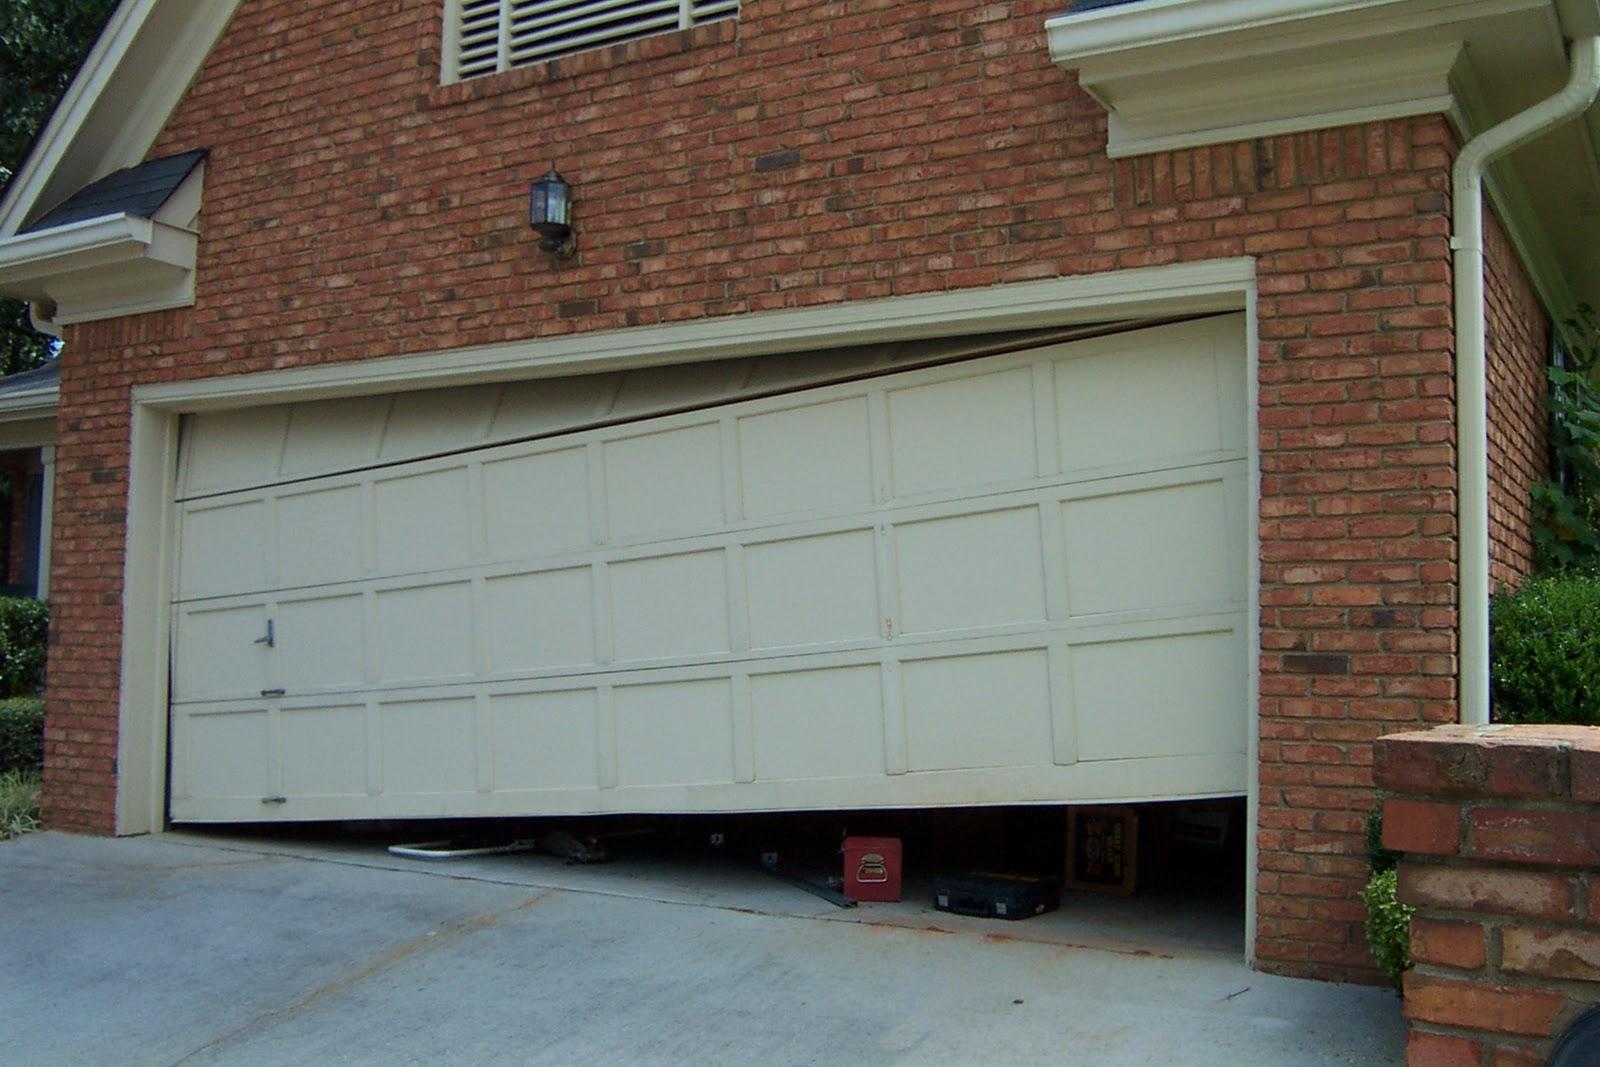 Garage Door Company Cerritos Ca A Quality Garage Doors 714 523